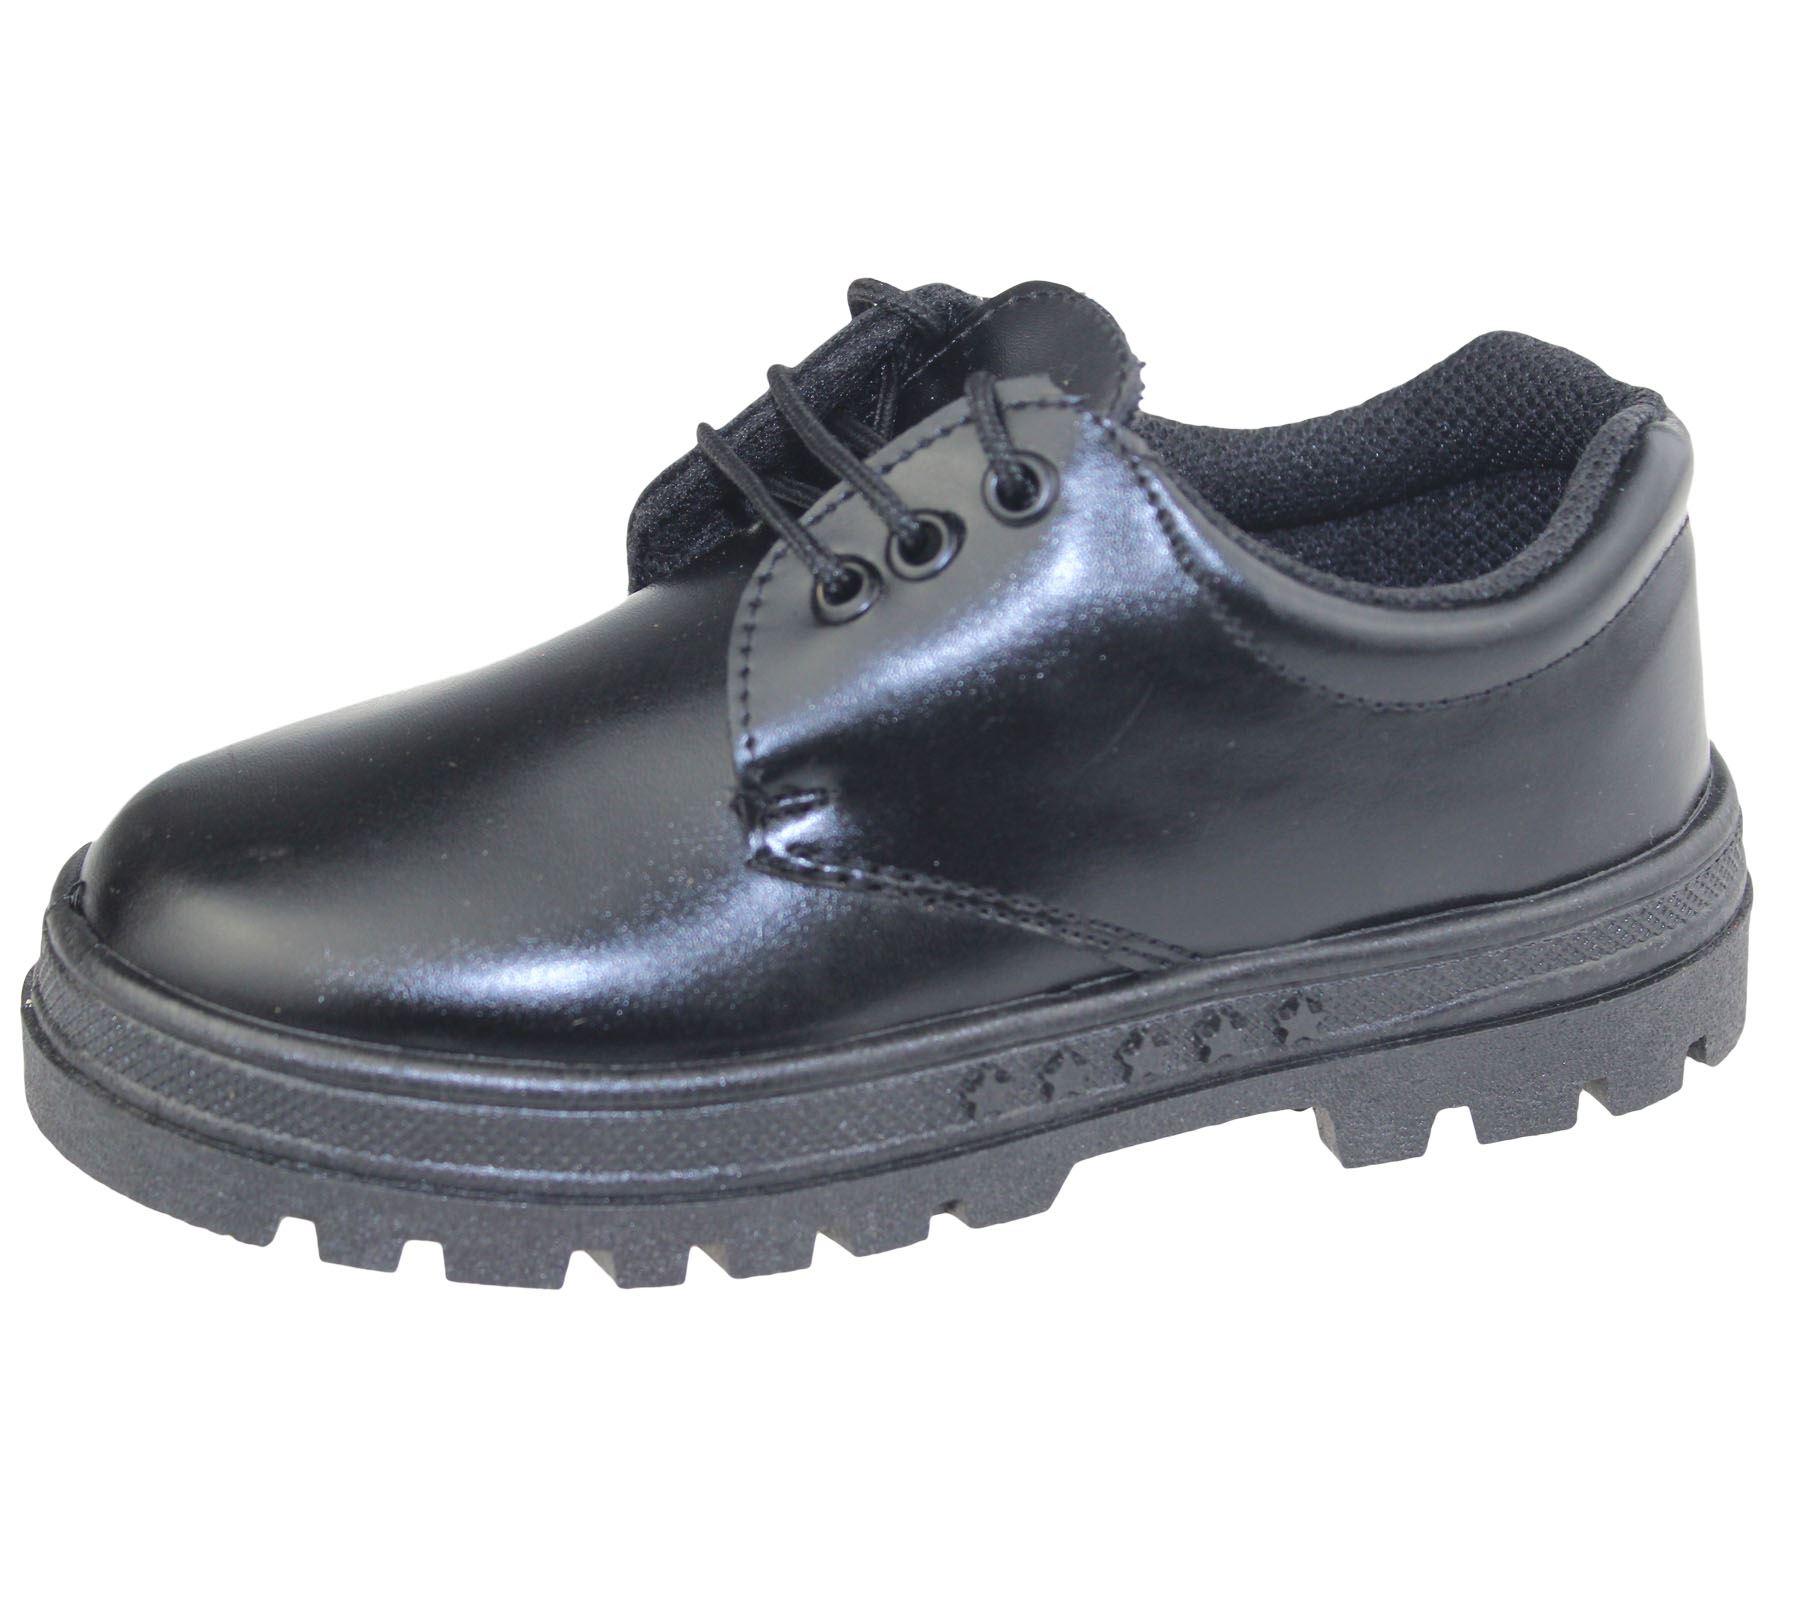 Bhs Black School Shoes